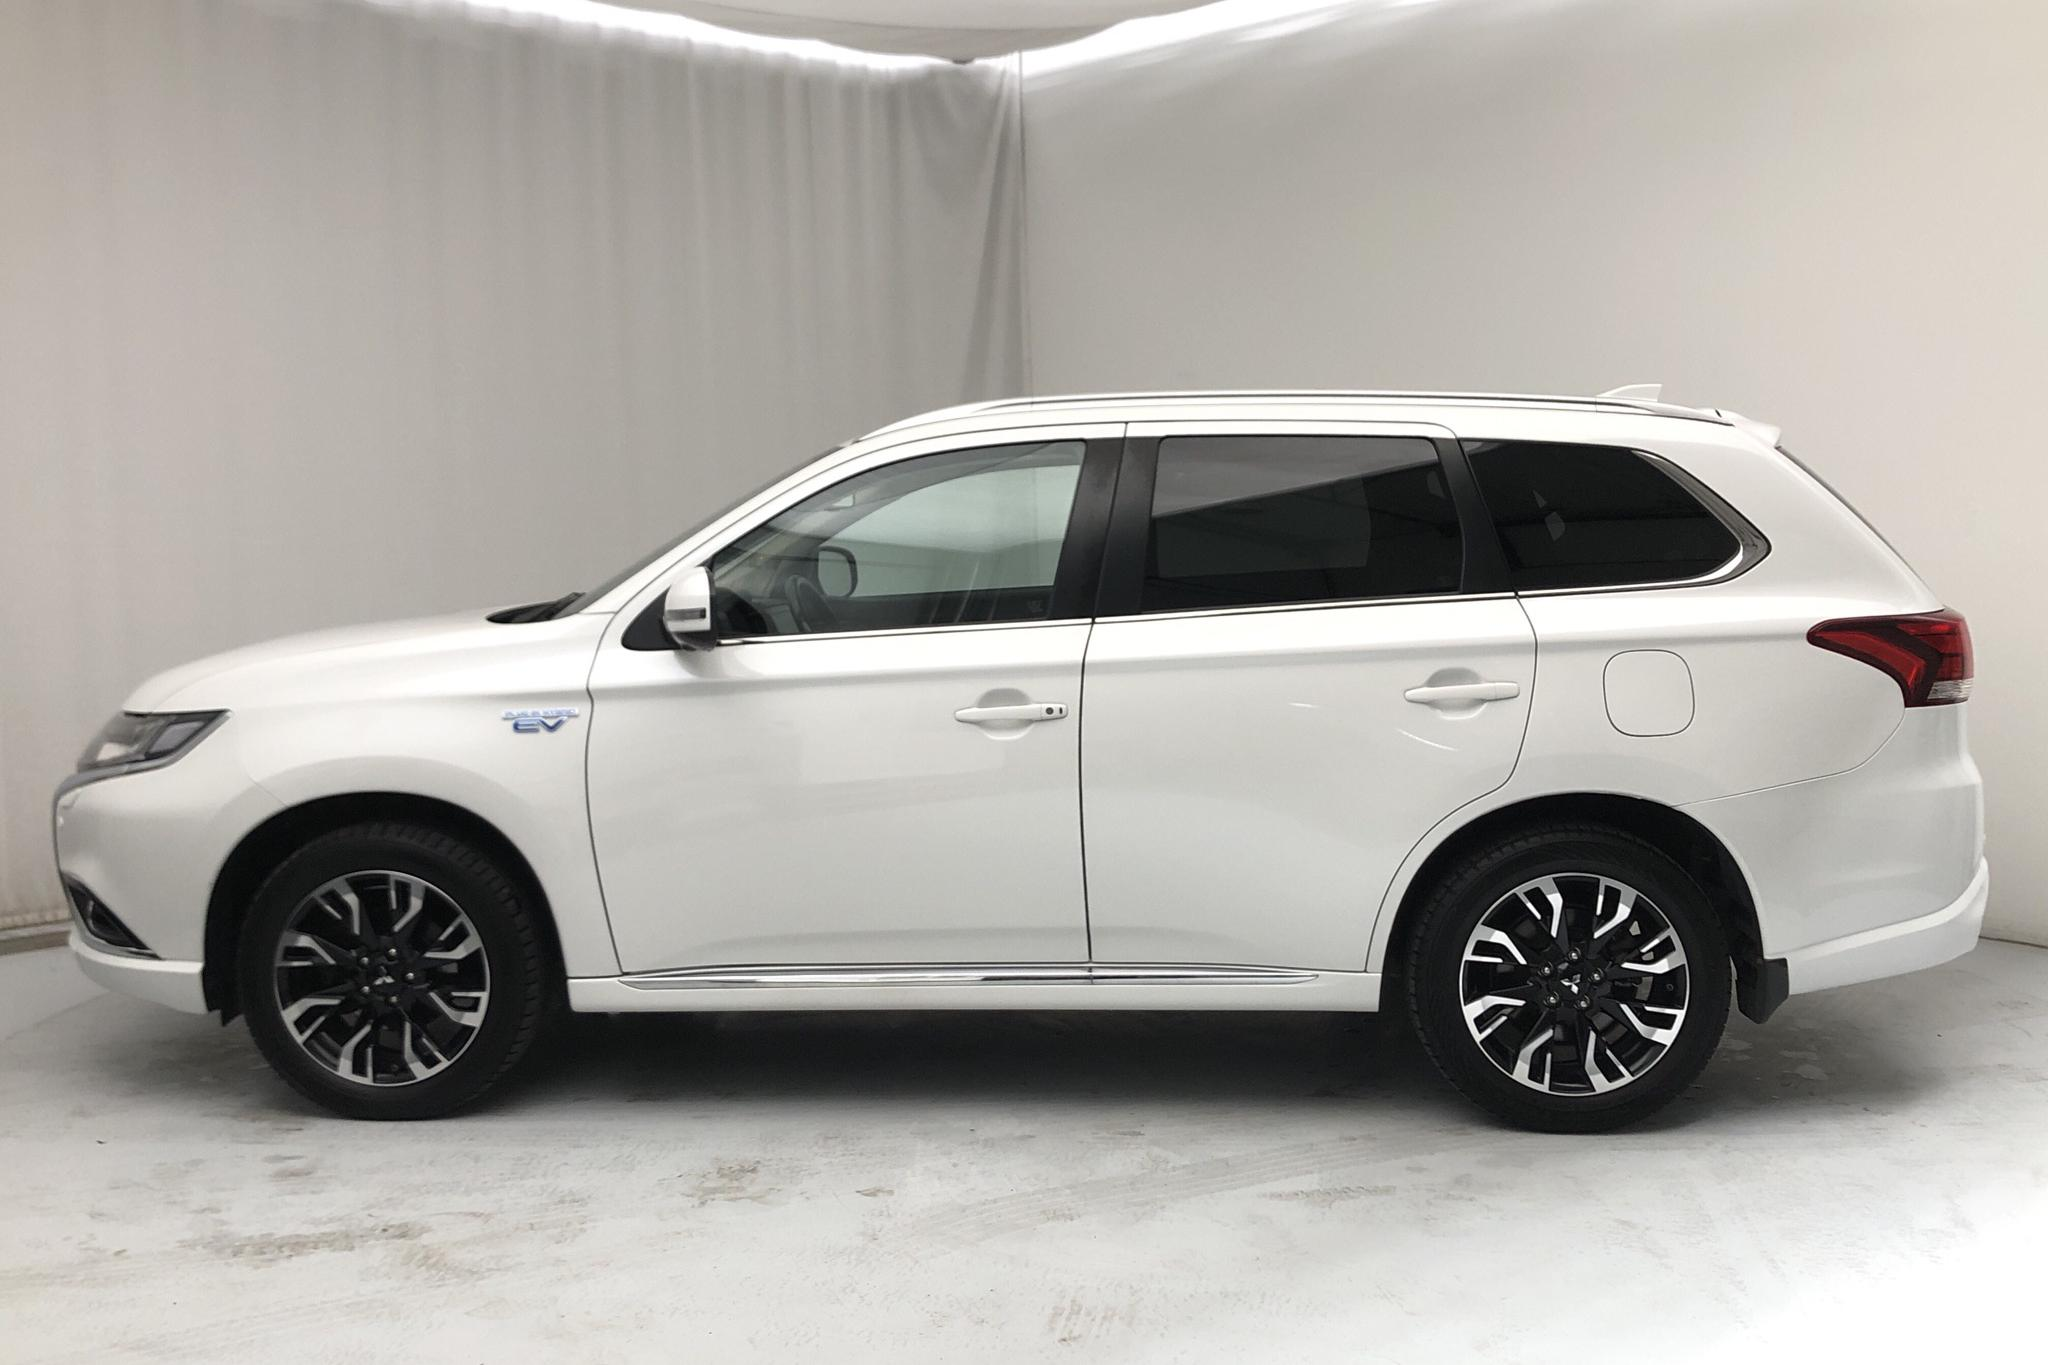 Mitsubishi Outlander 2.0 Plug-in Hybrid 4WD (121hk) - 111 450 km - Automatic - white - 2017